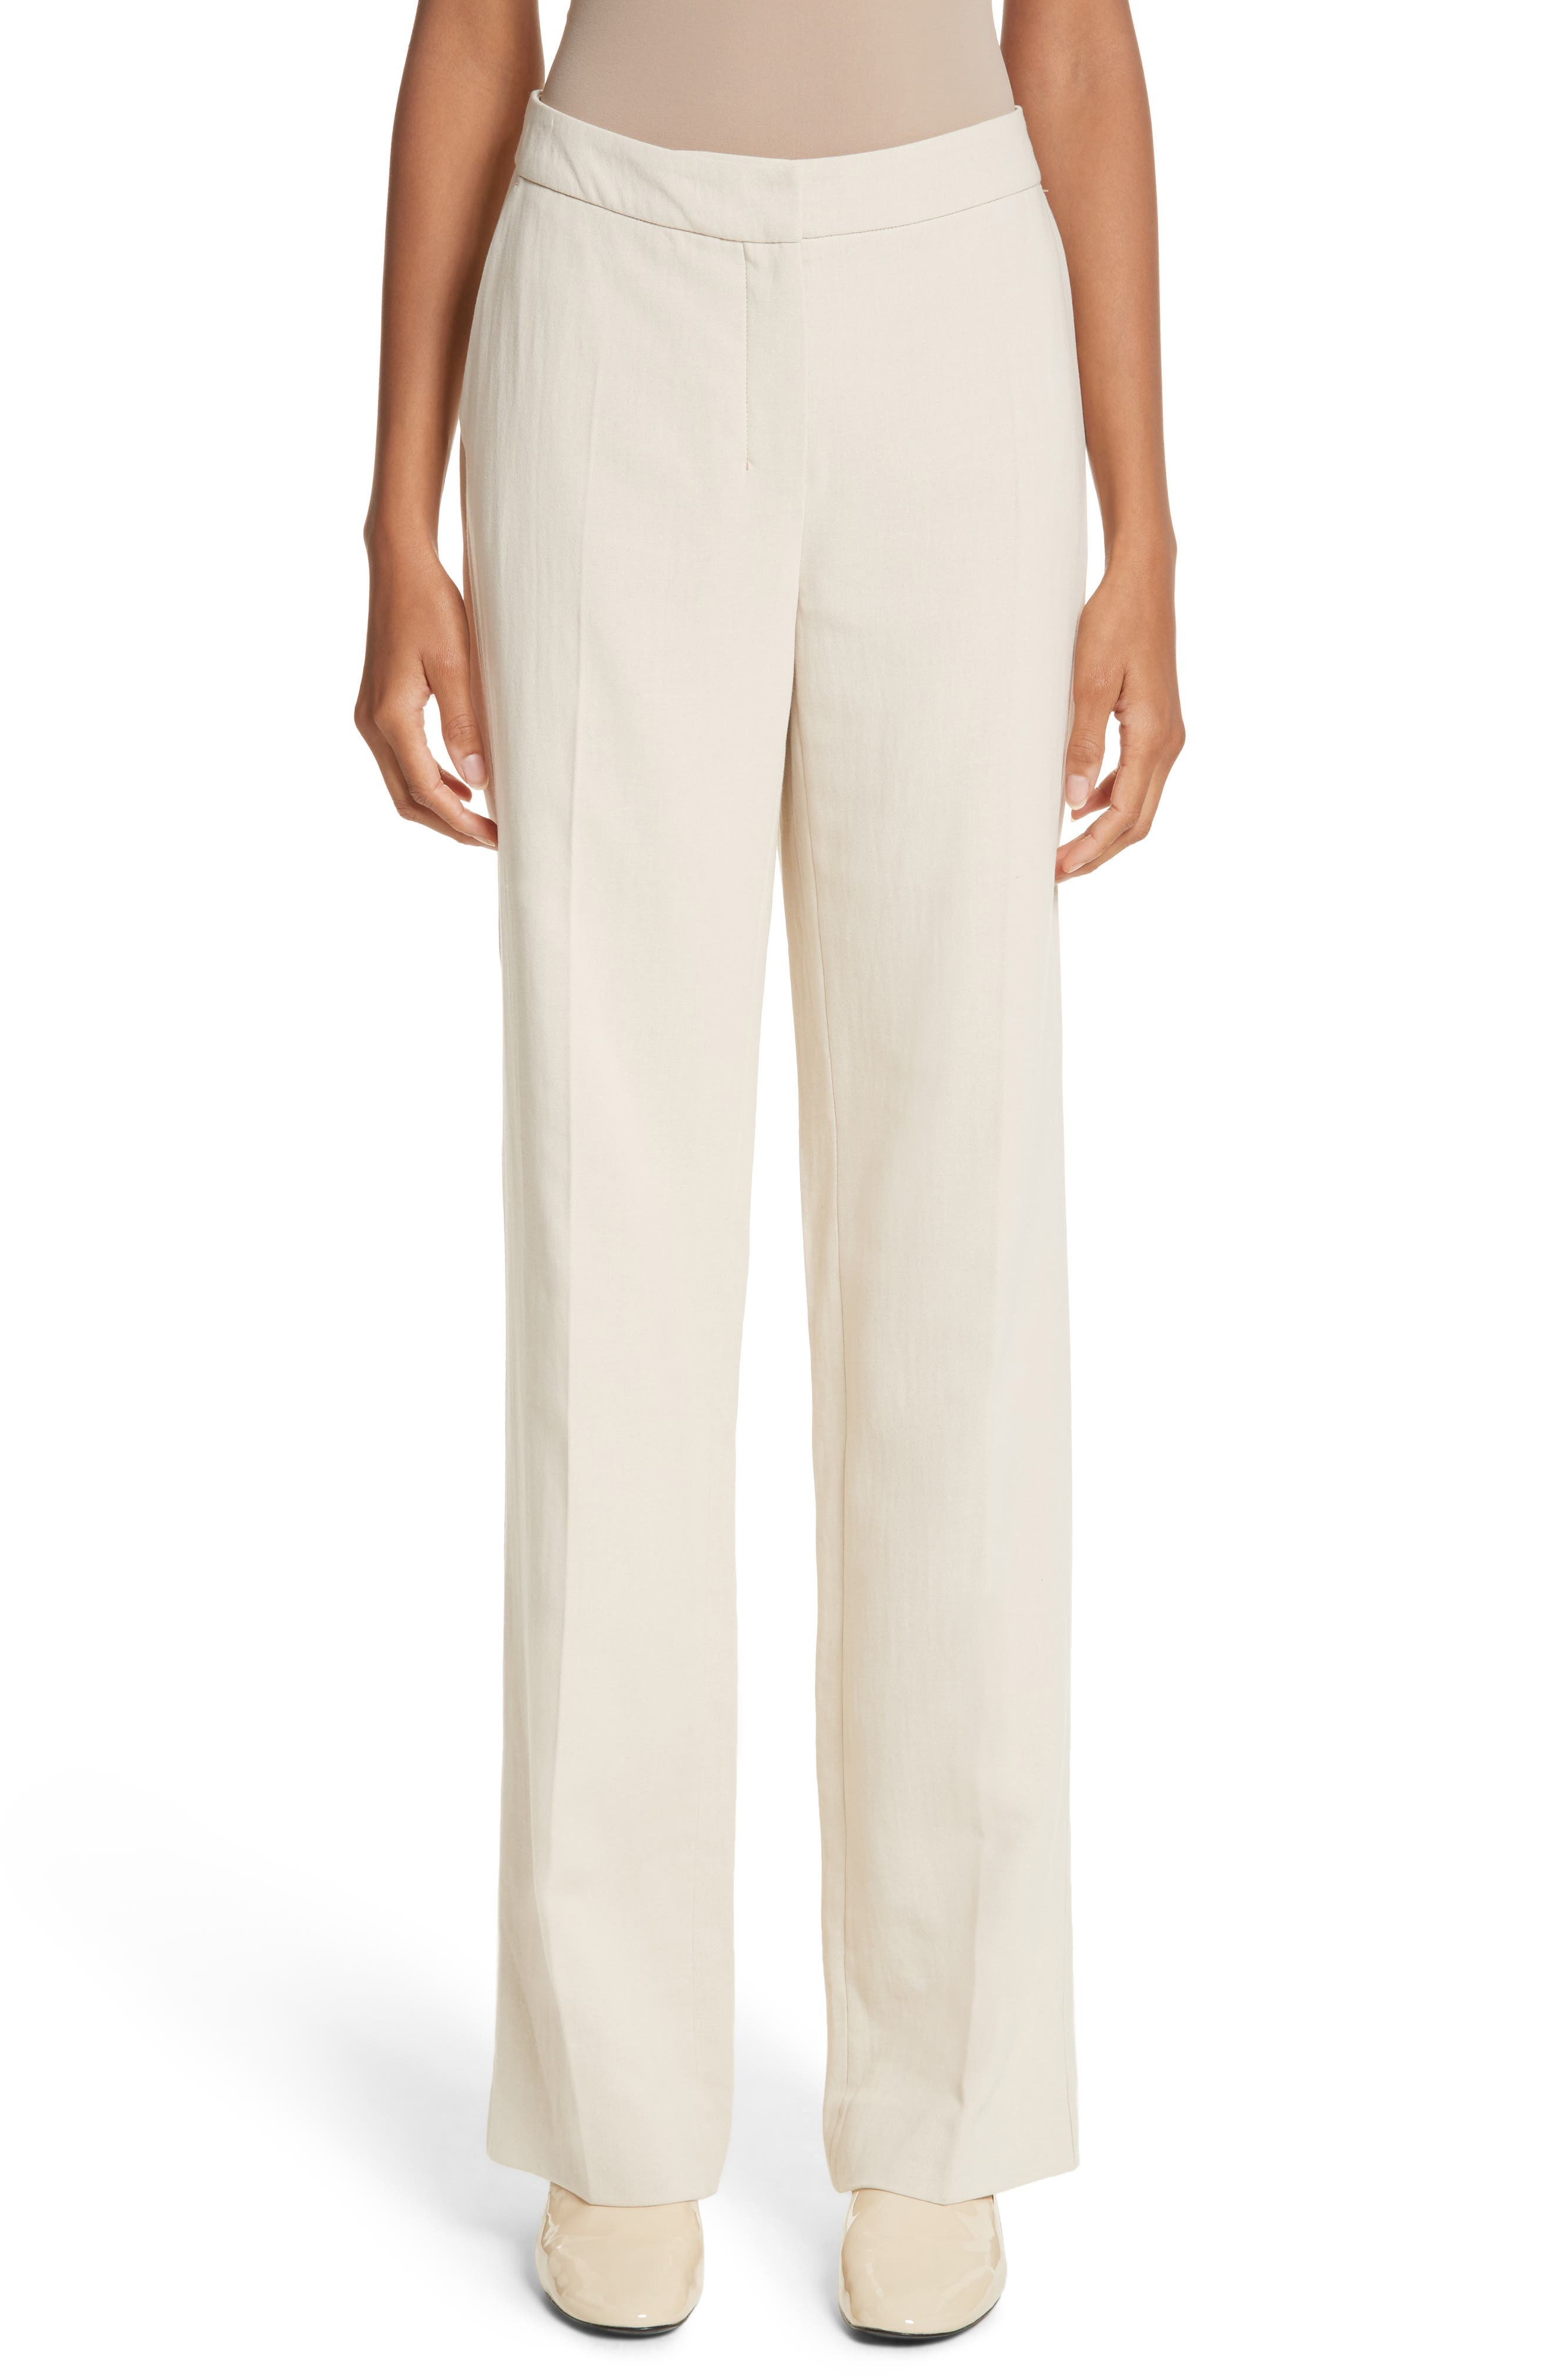 MAX MARA, Cursore Cotton Wide Leg Pants, Main thumbnail 1, color, 900